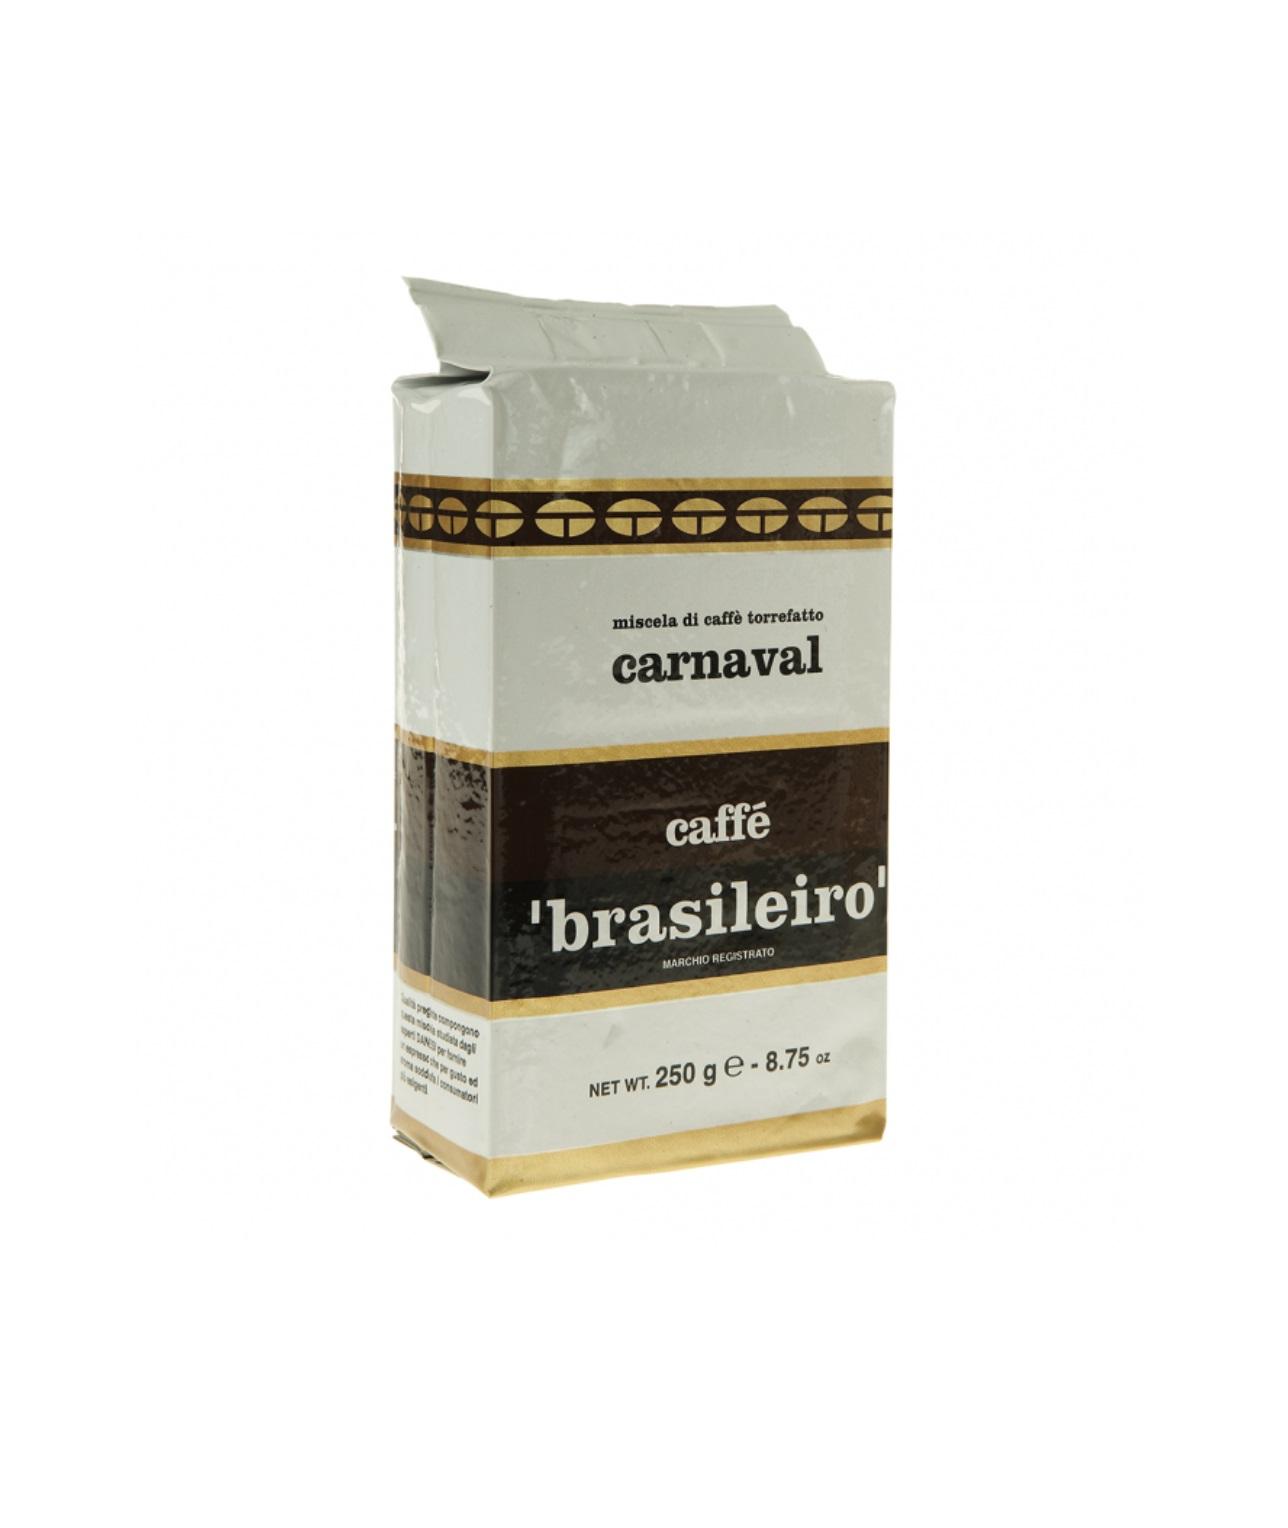 Онлайн каталог PROMENU: Кофе Brasileiro Carnaval Danesi, 0,25 кг, вакуумный пакет Danesi 2010340